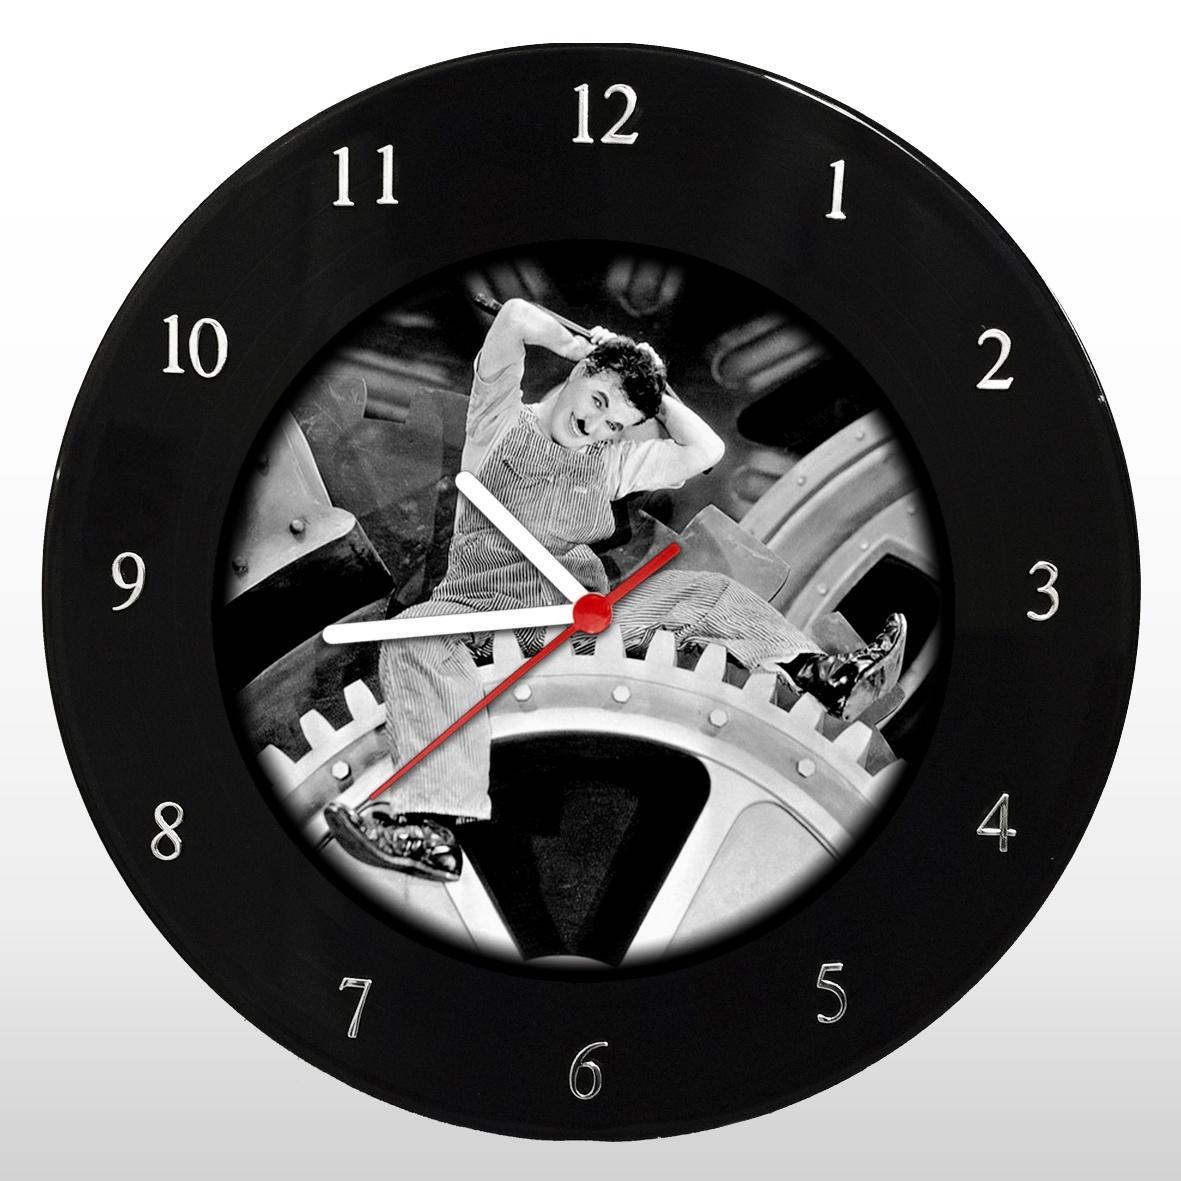 Charles Chaplin - Relógio de Parede em Disco de Vinil - Mr. Rock